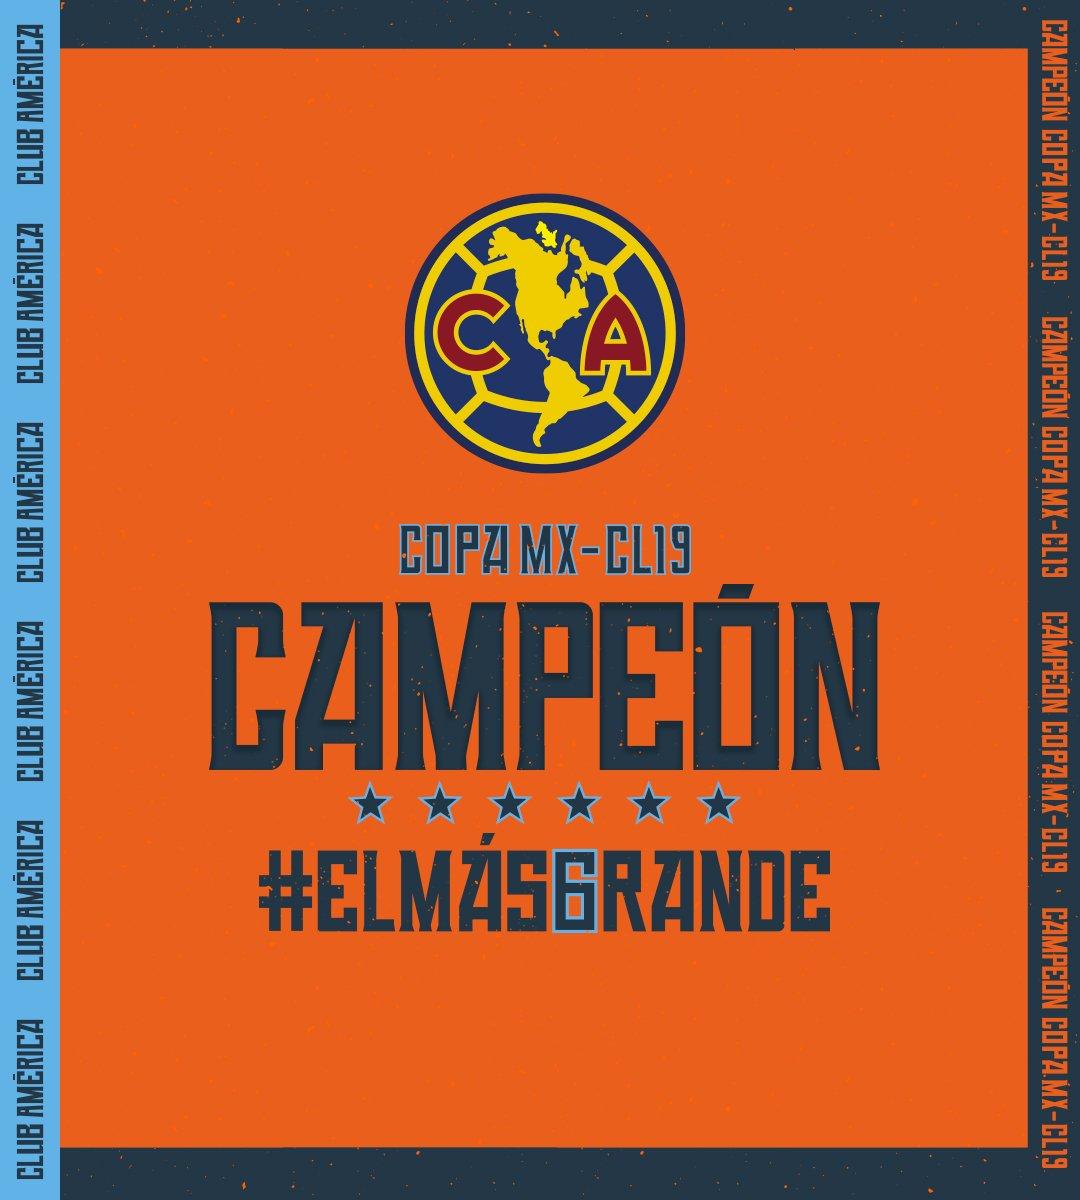 RT @ClubAmerica: ????????????????????????  ¡ L A  S E X T A ! #ELMÁS6RANDE https://t.co/TdTLcM8Sbh